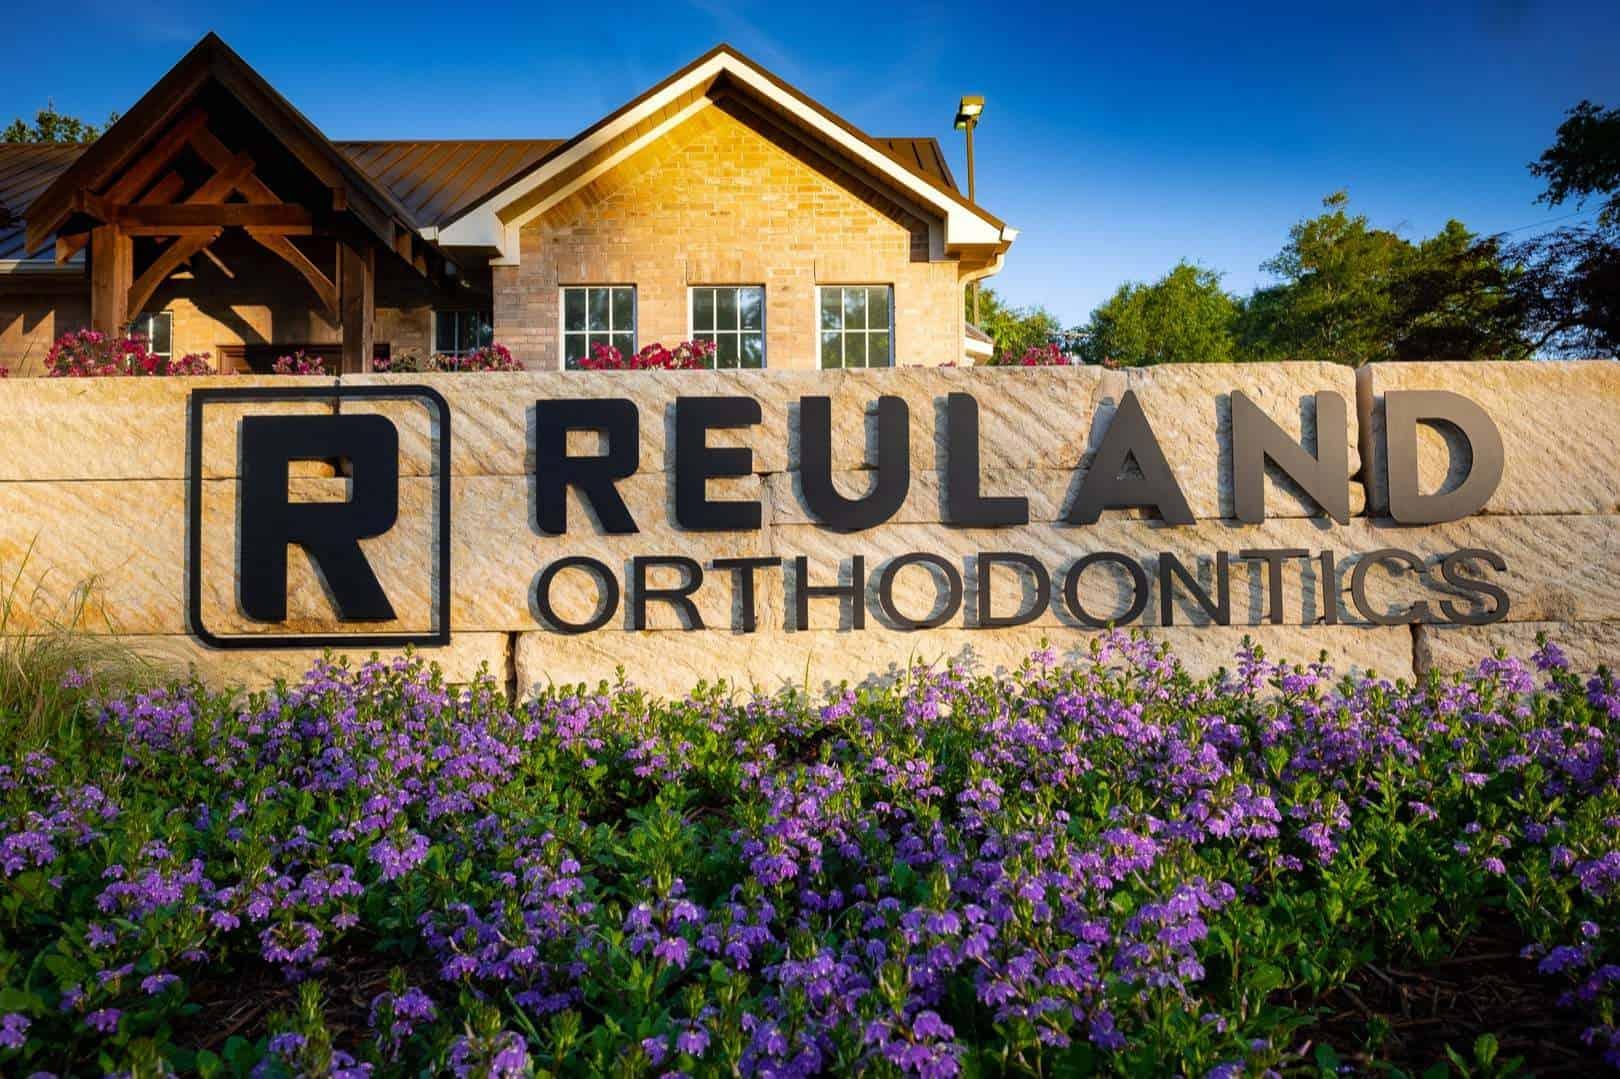 Reuland Orthodontics Exteriors 2018 4 1 - BIG NEWS: Dr. Barnhart Joins the Reuland & Barnhart Orthodontics Team Today!